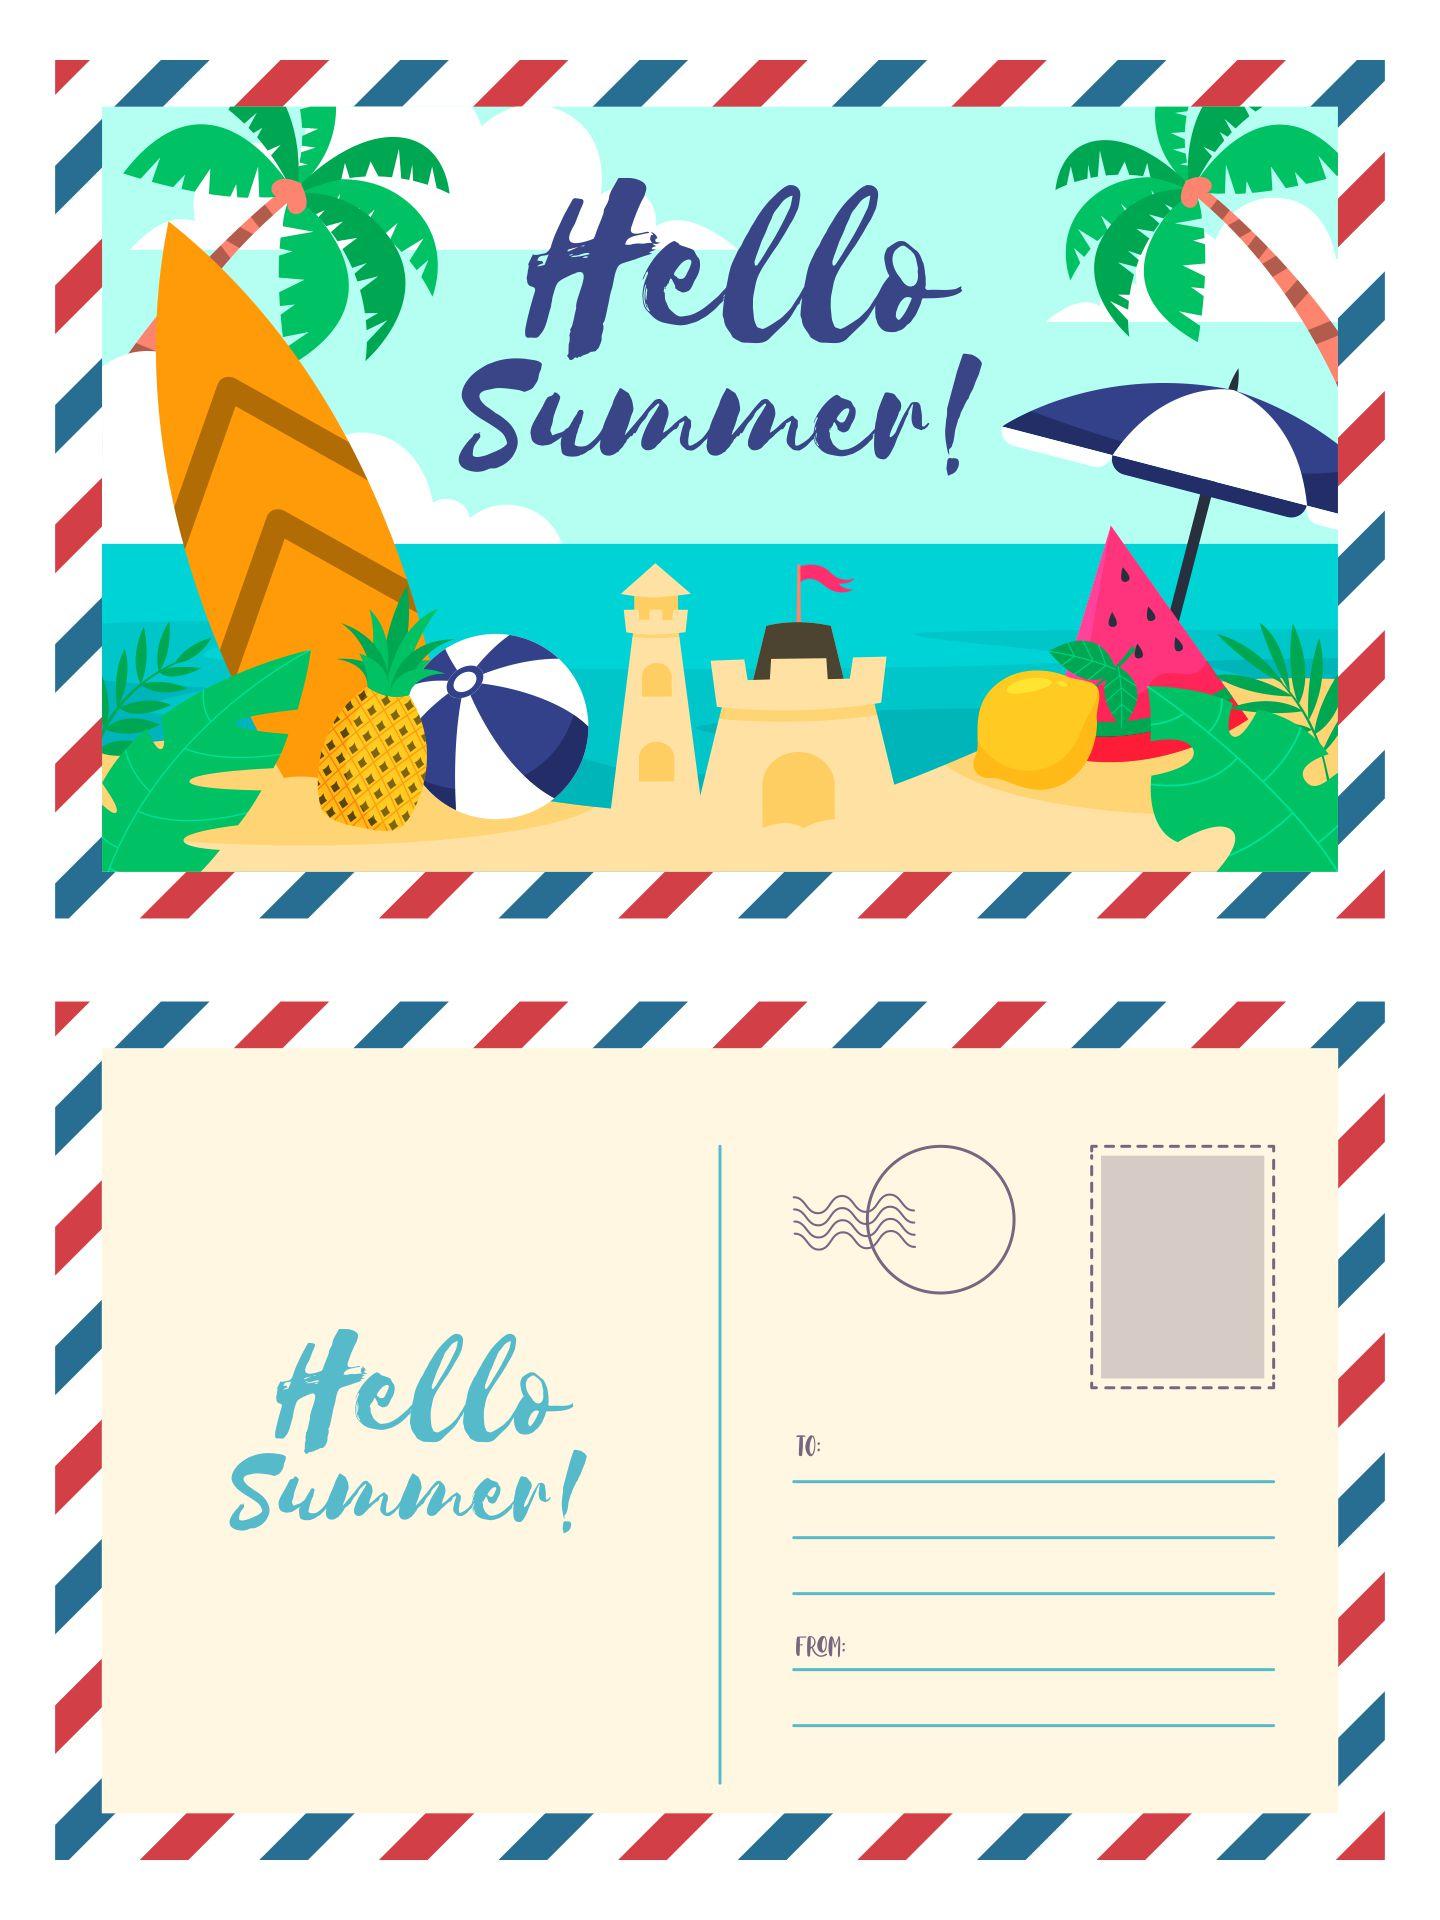 Printable Summer Vacation Postcards